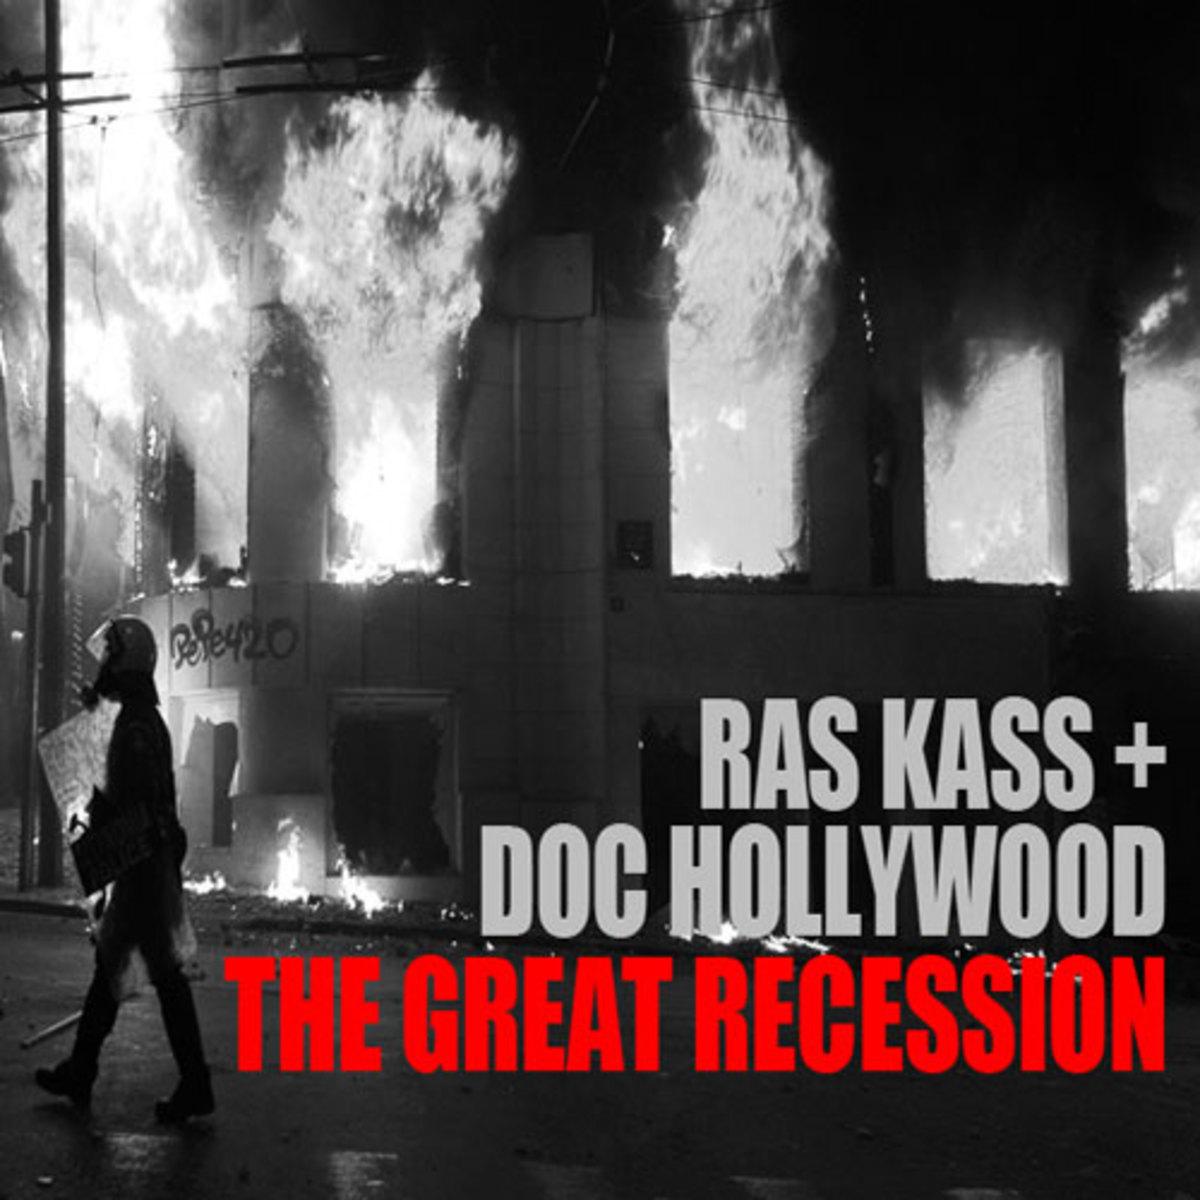 raskass-thegreatrecession.jpg